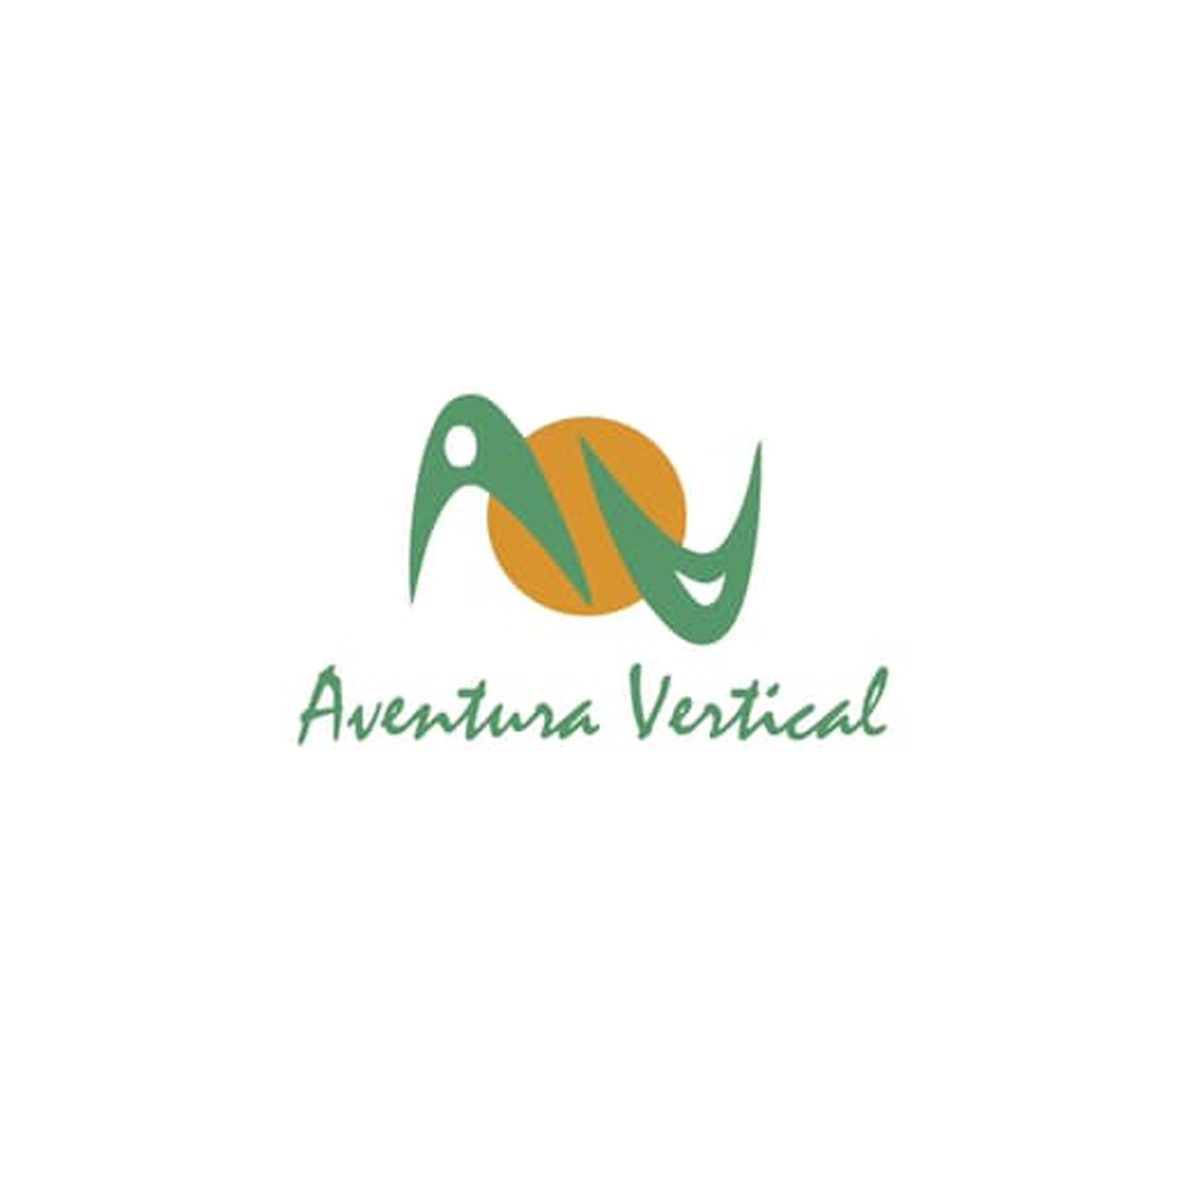 aventura-vertical-3